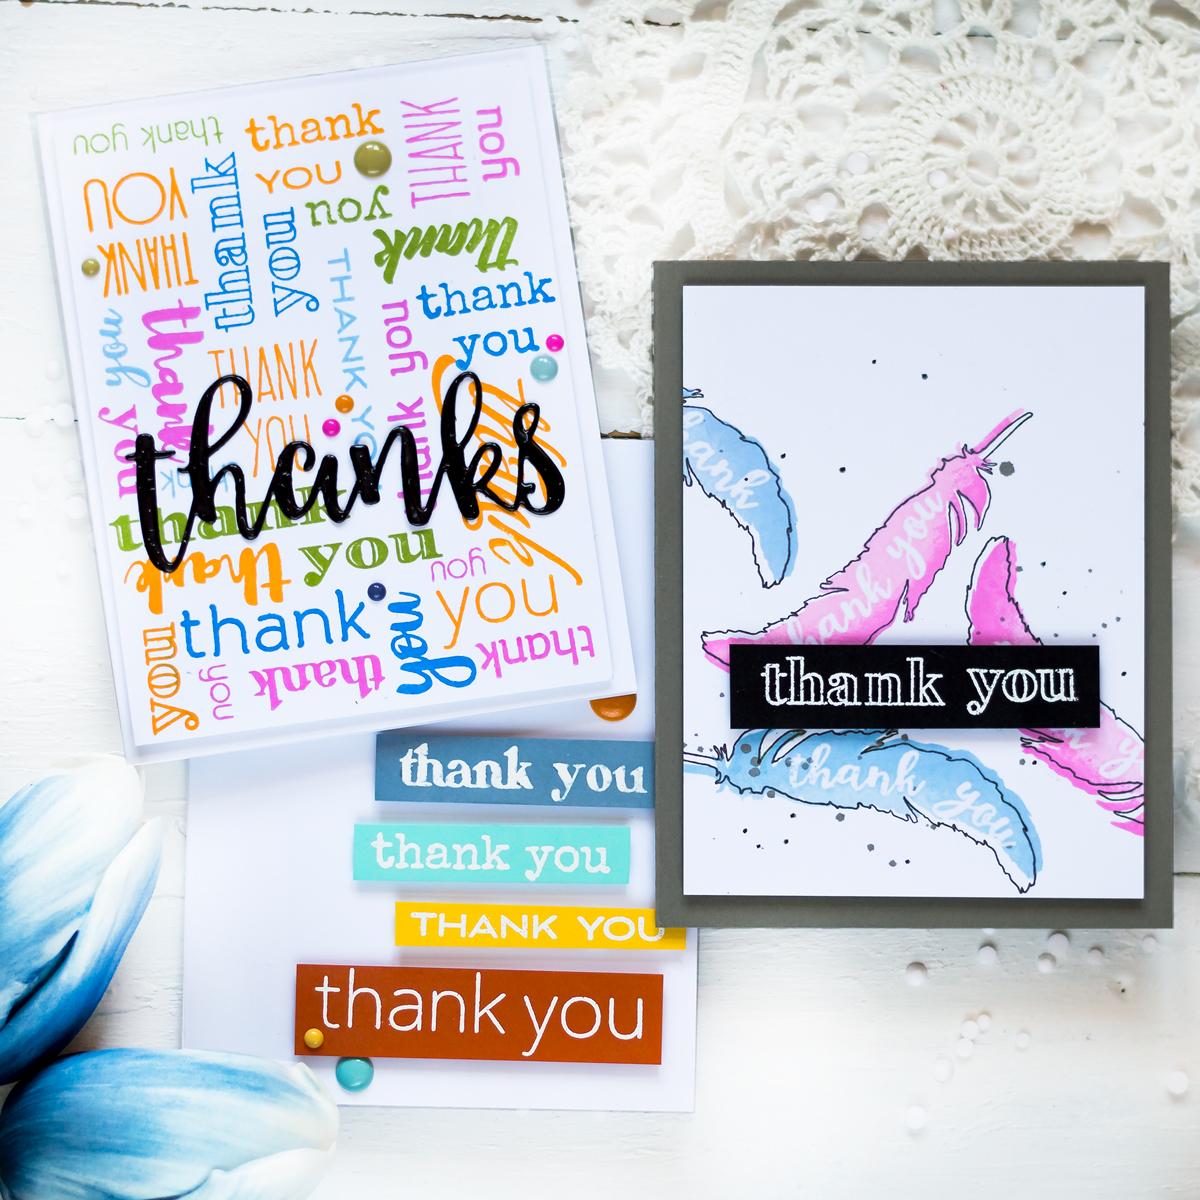 Altenew Thank You Builder Stamp Set. Card by Svitlana Shayevich